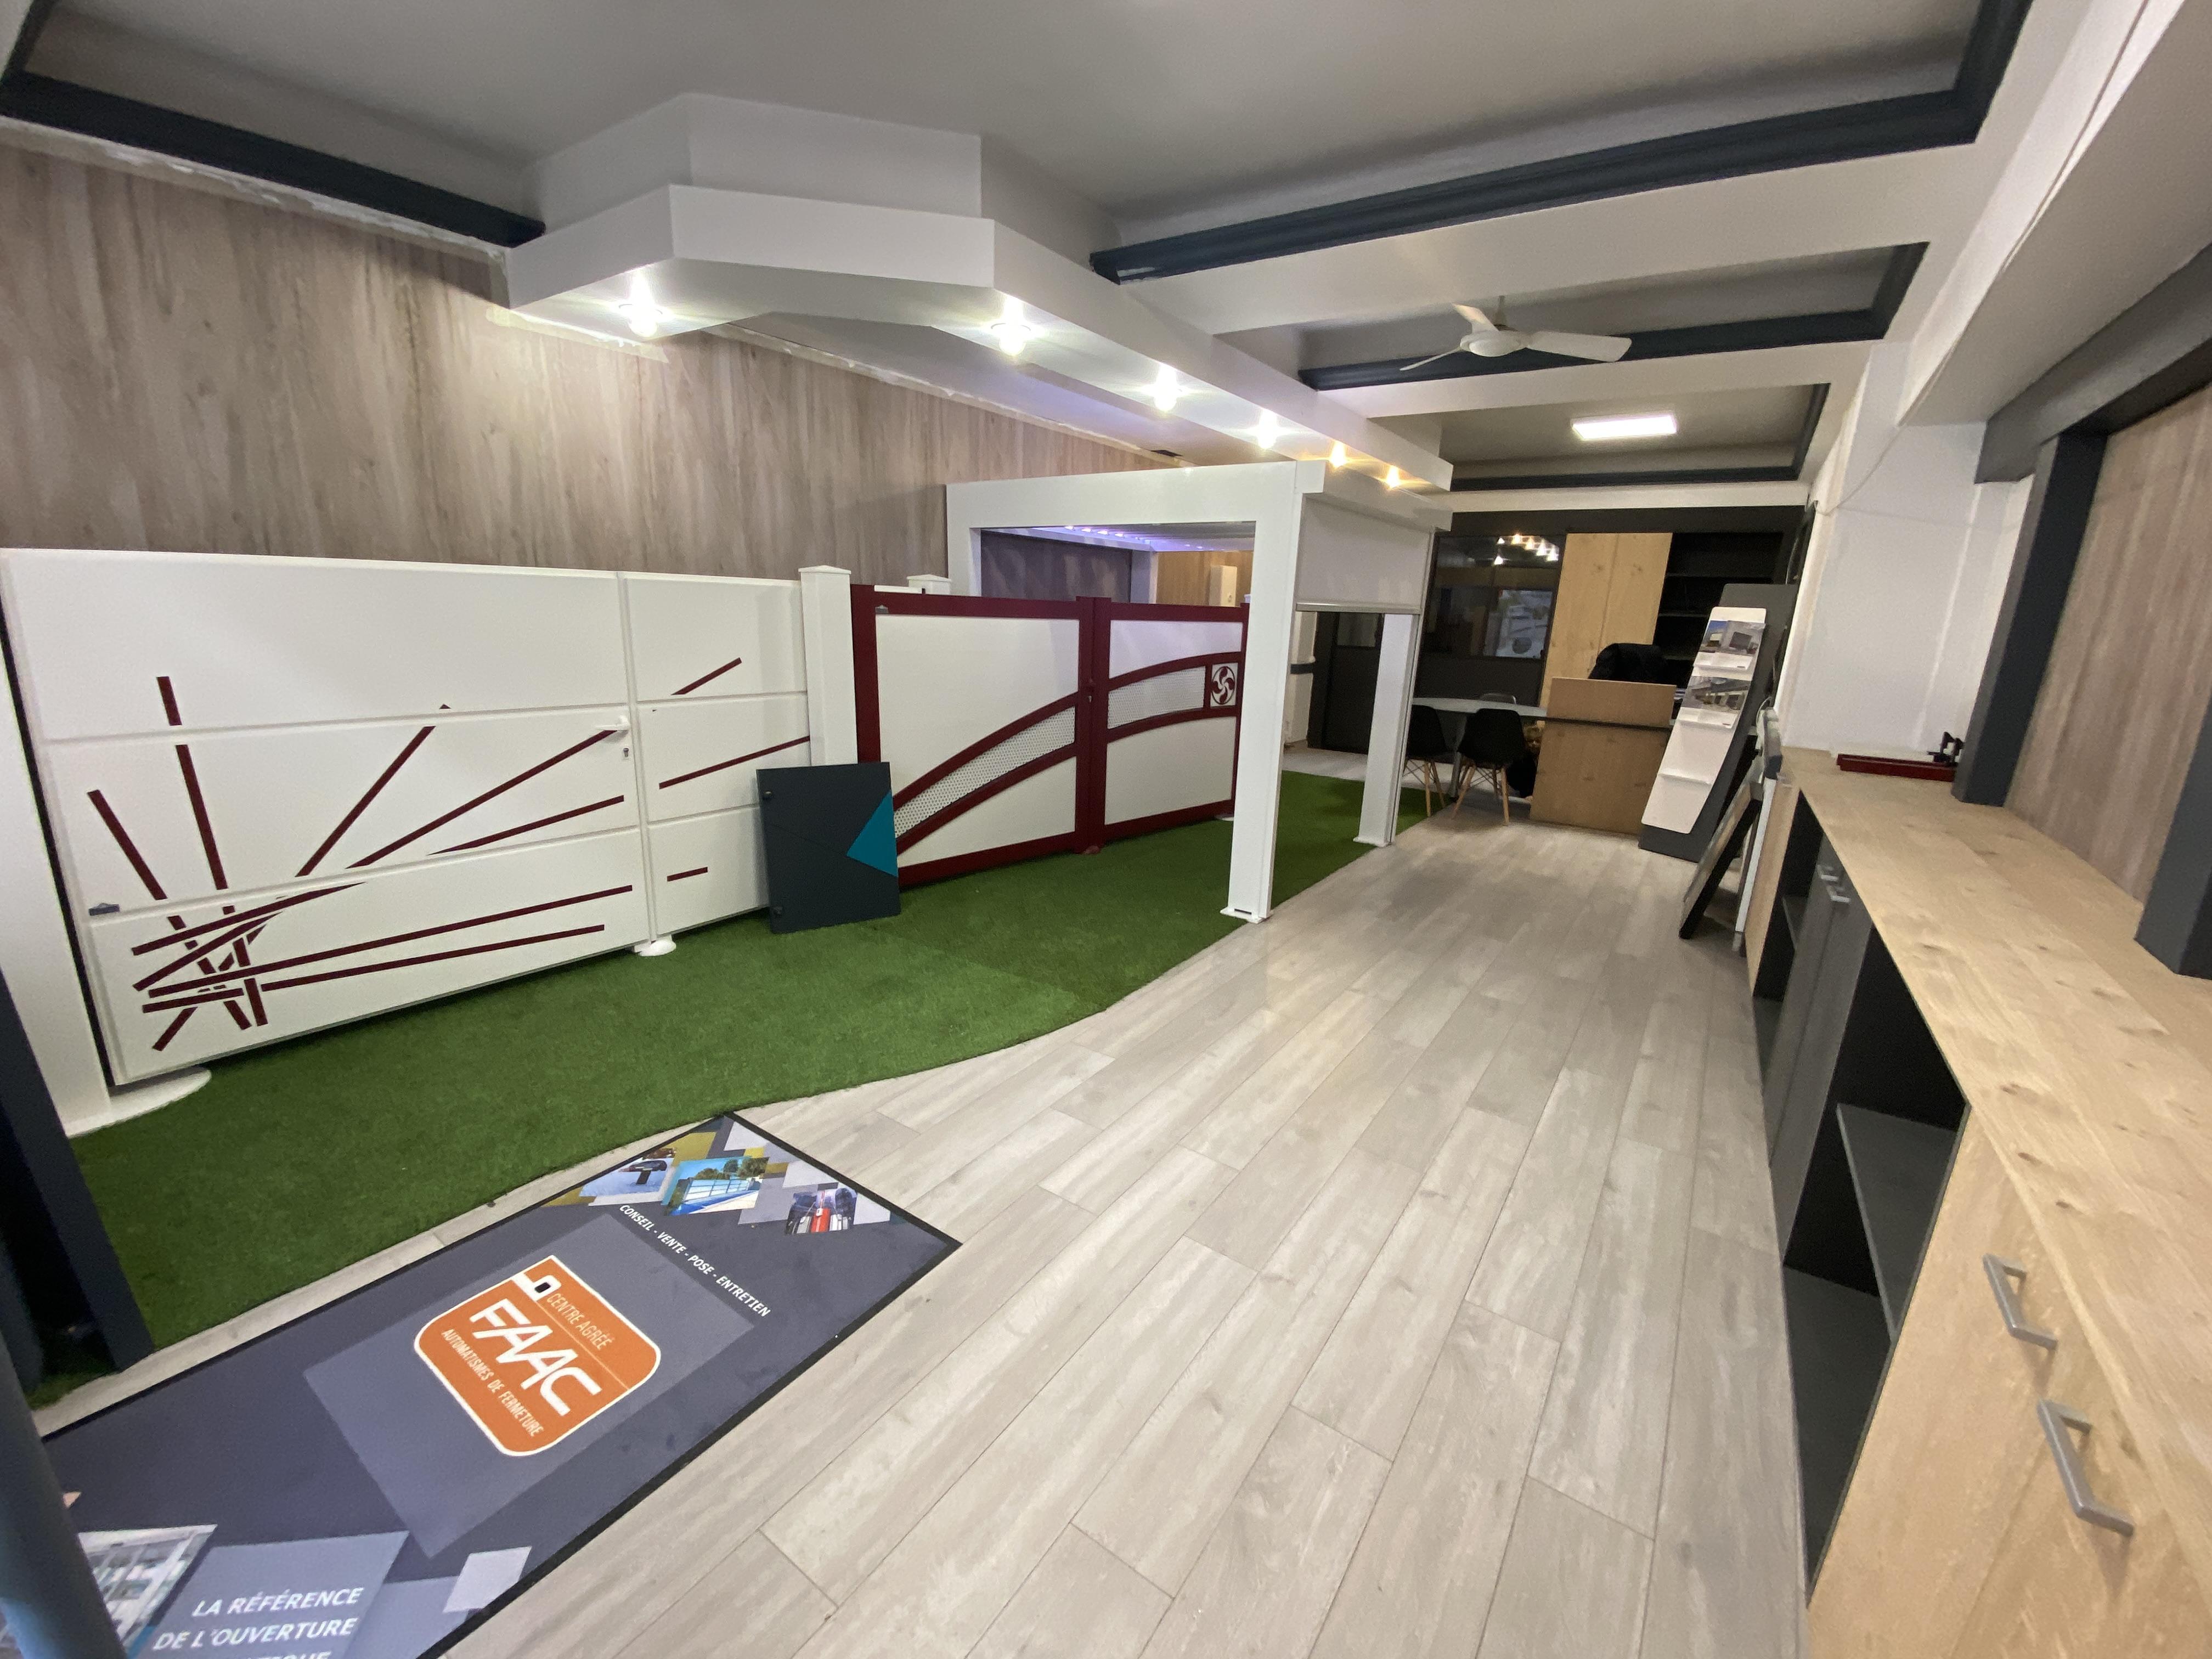 Showroom de votre artisan AED64 Hasparren portail pergola automatisme